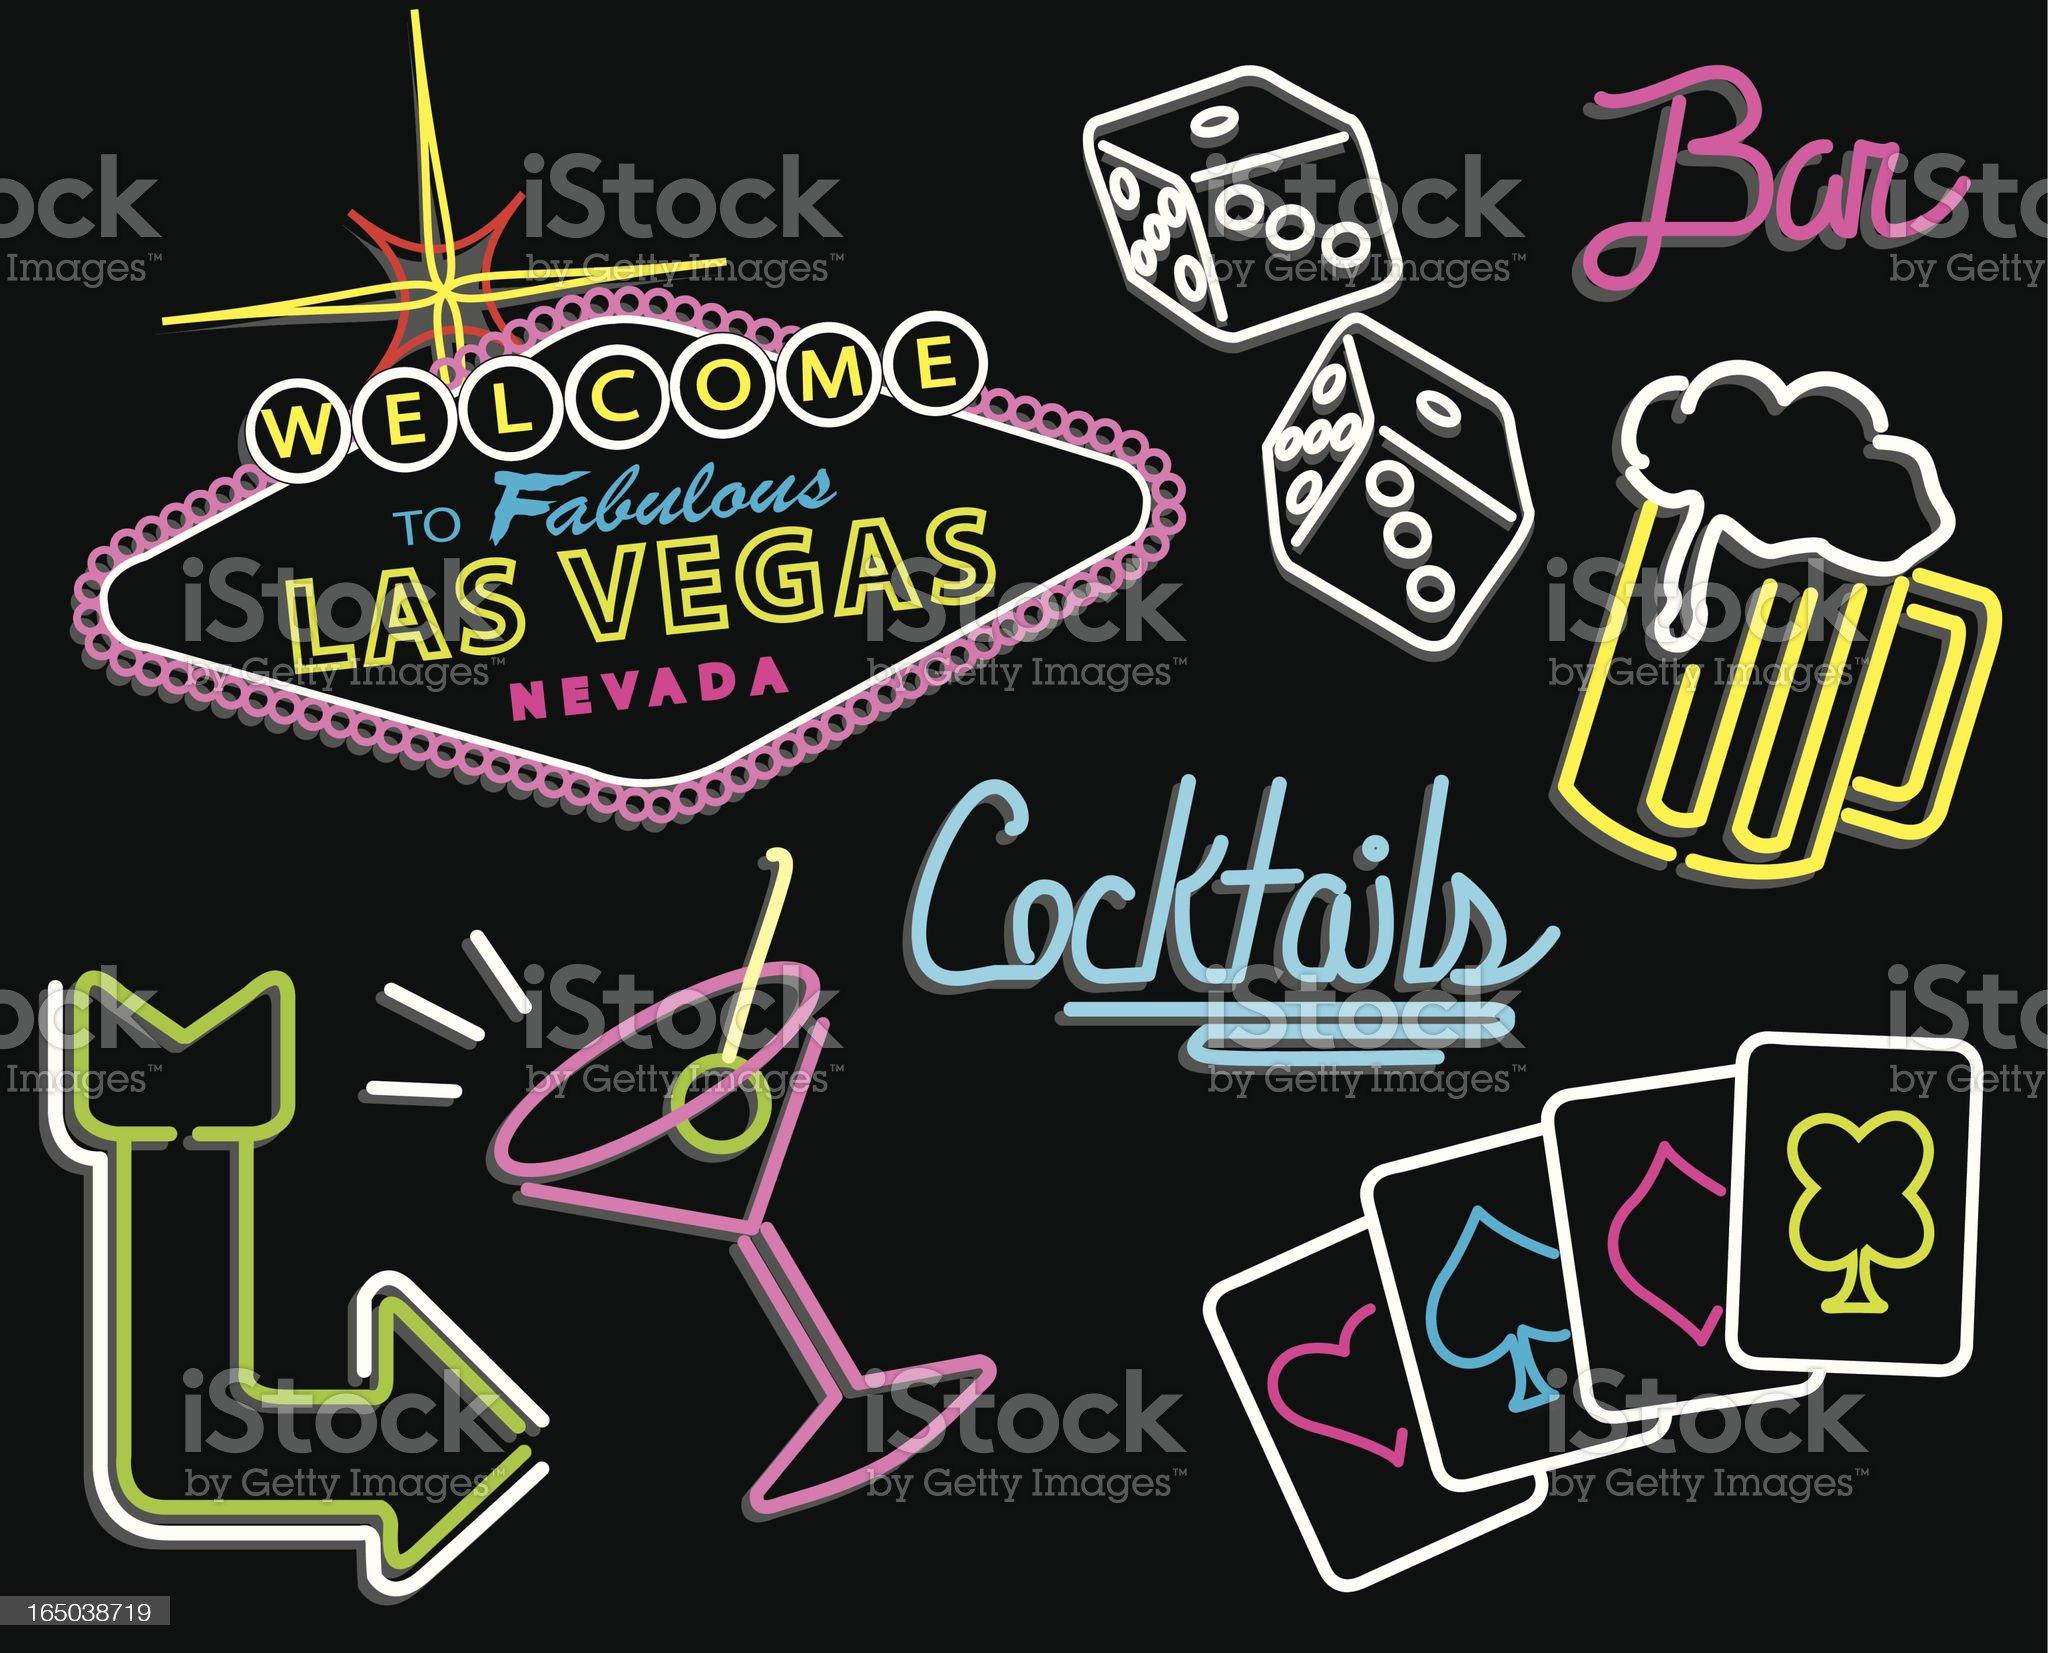 Las Vegas - Neon Signs royalty-free stock vector art